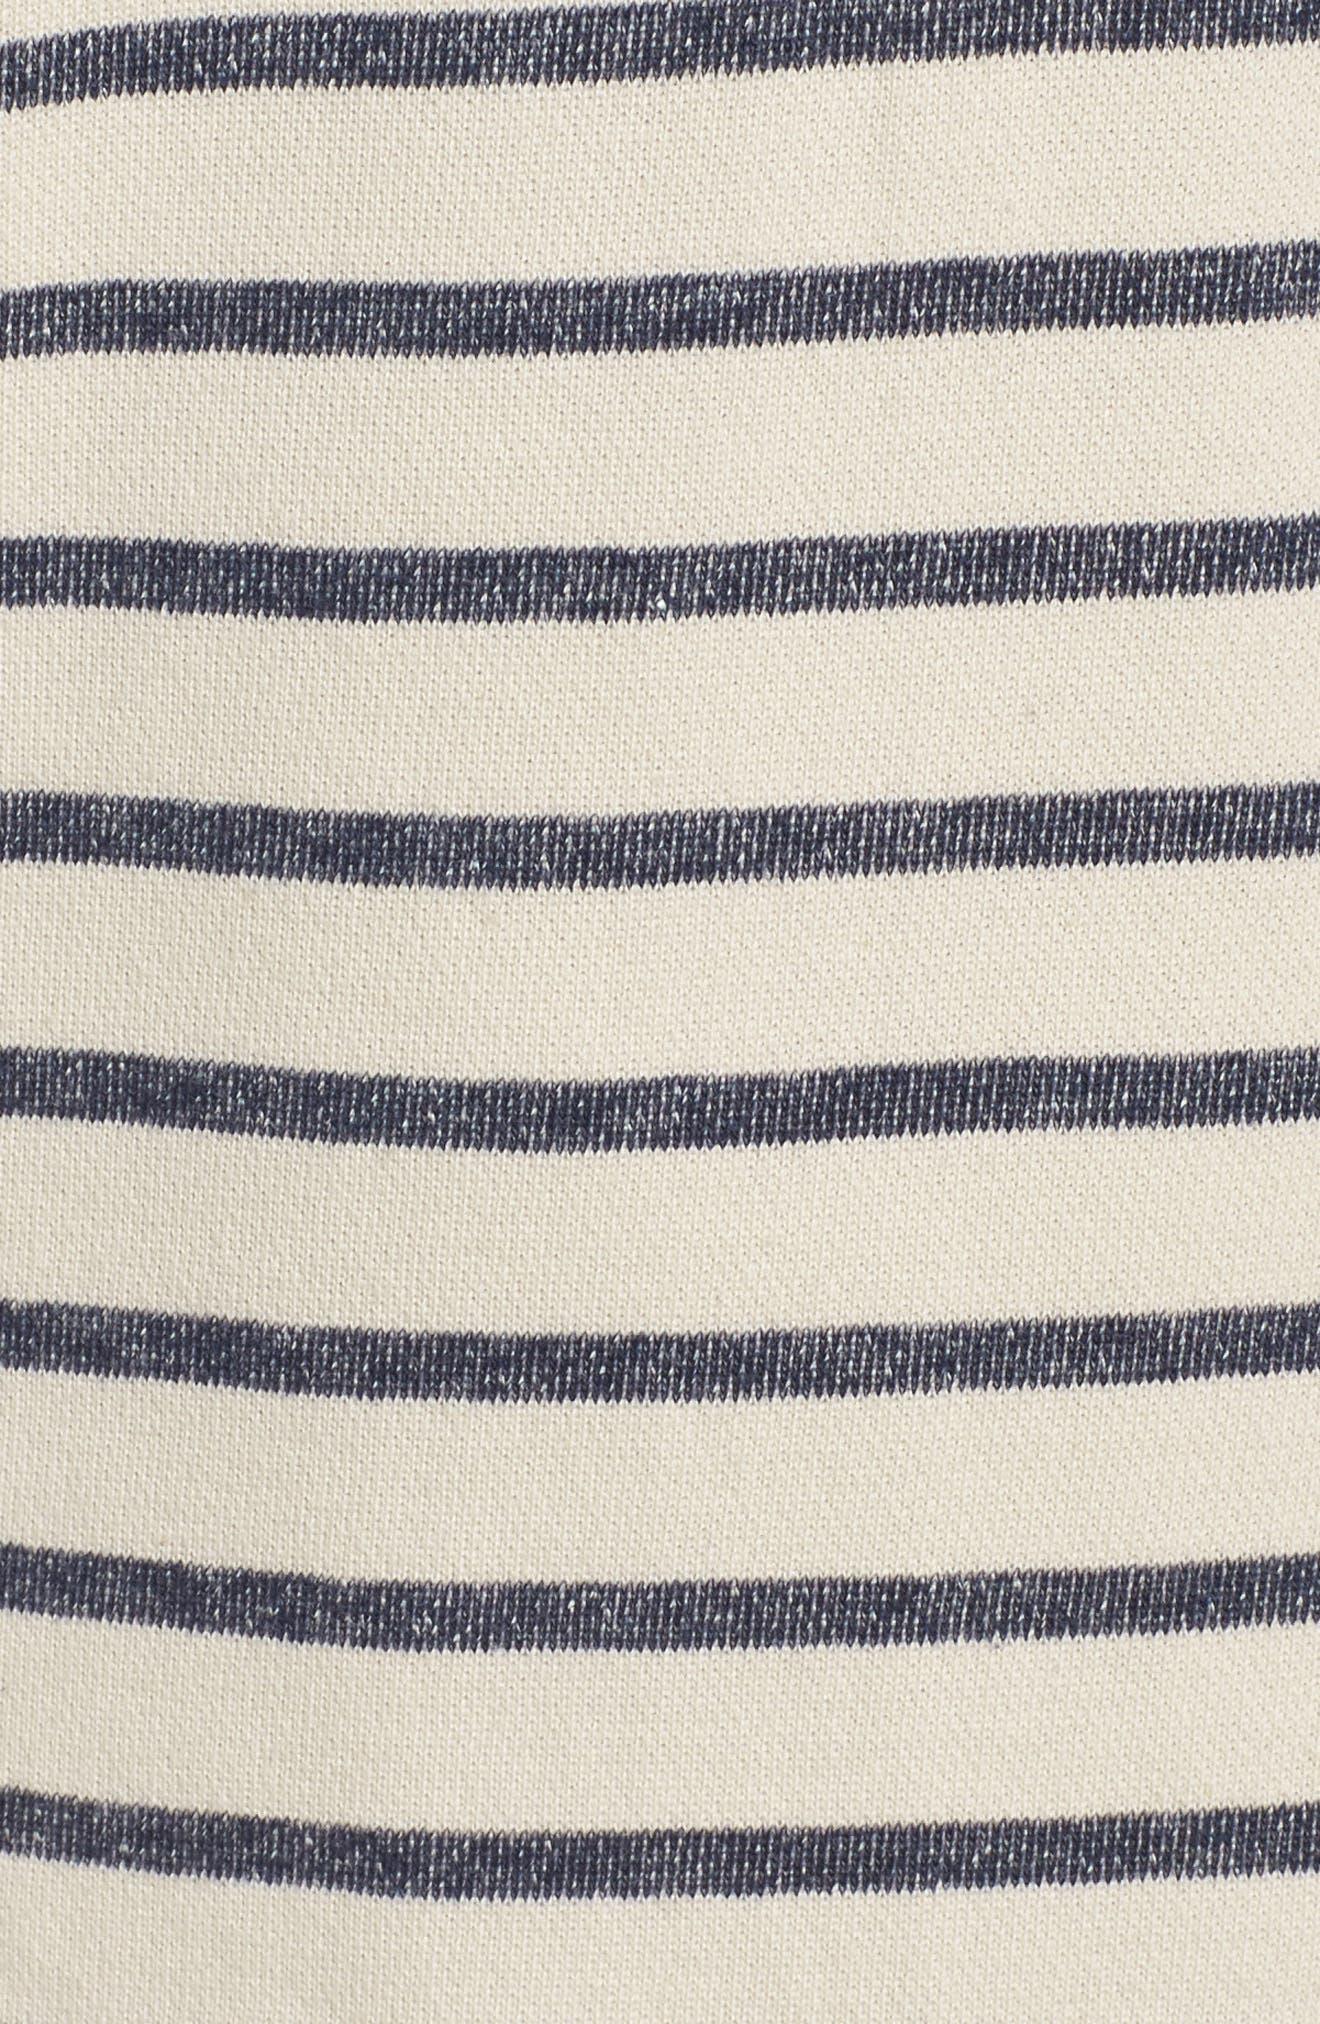 Normandy Stripe Dress,                             Alternate thumbnail 6, color,                             Brule/ Indigo